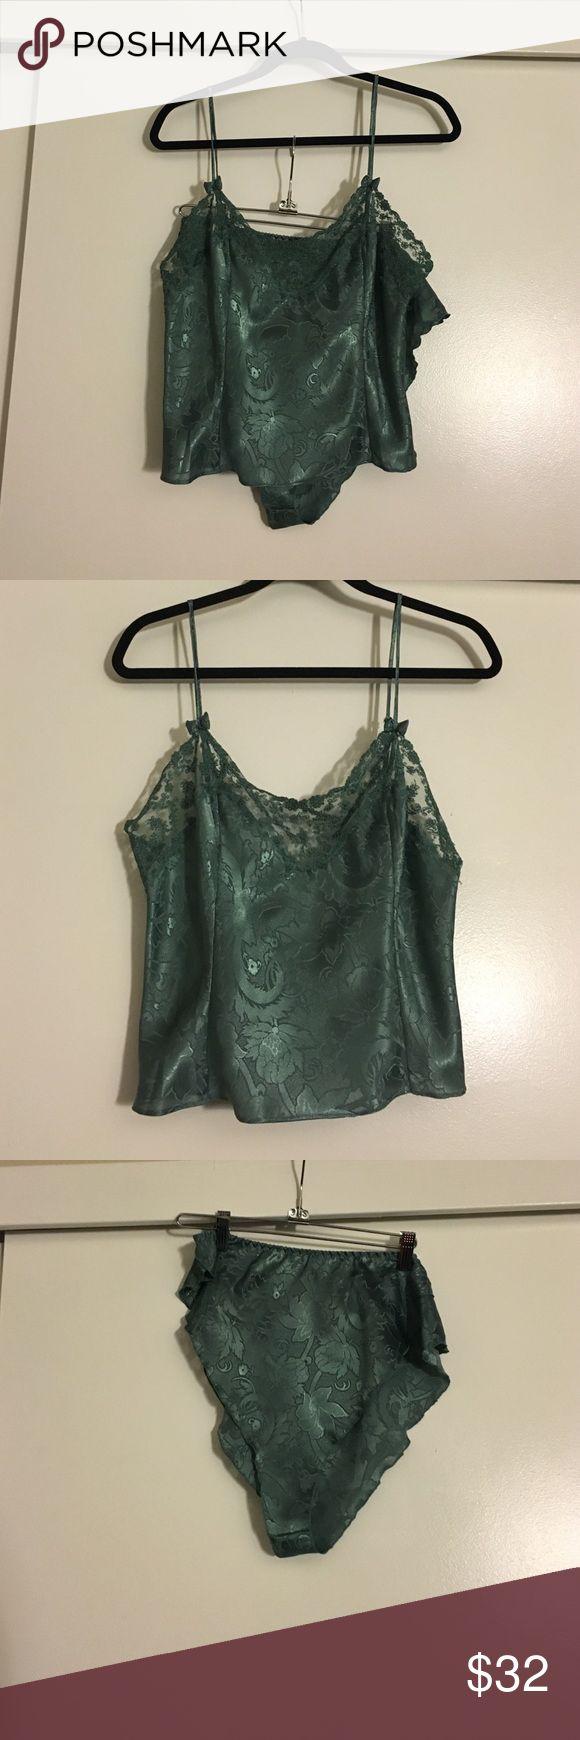 VS Lingerie Set NWOT VS Lingerie emerald green set! Too big for me never worn! Size medium! Victoria's Secret Intimates & Sleepwear